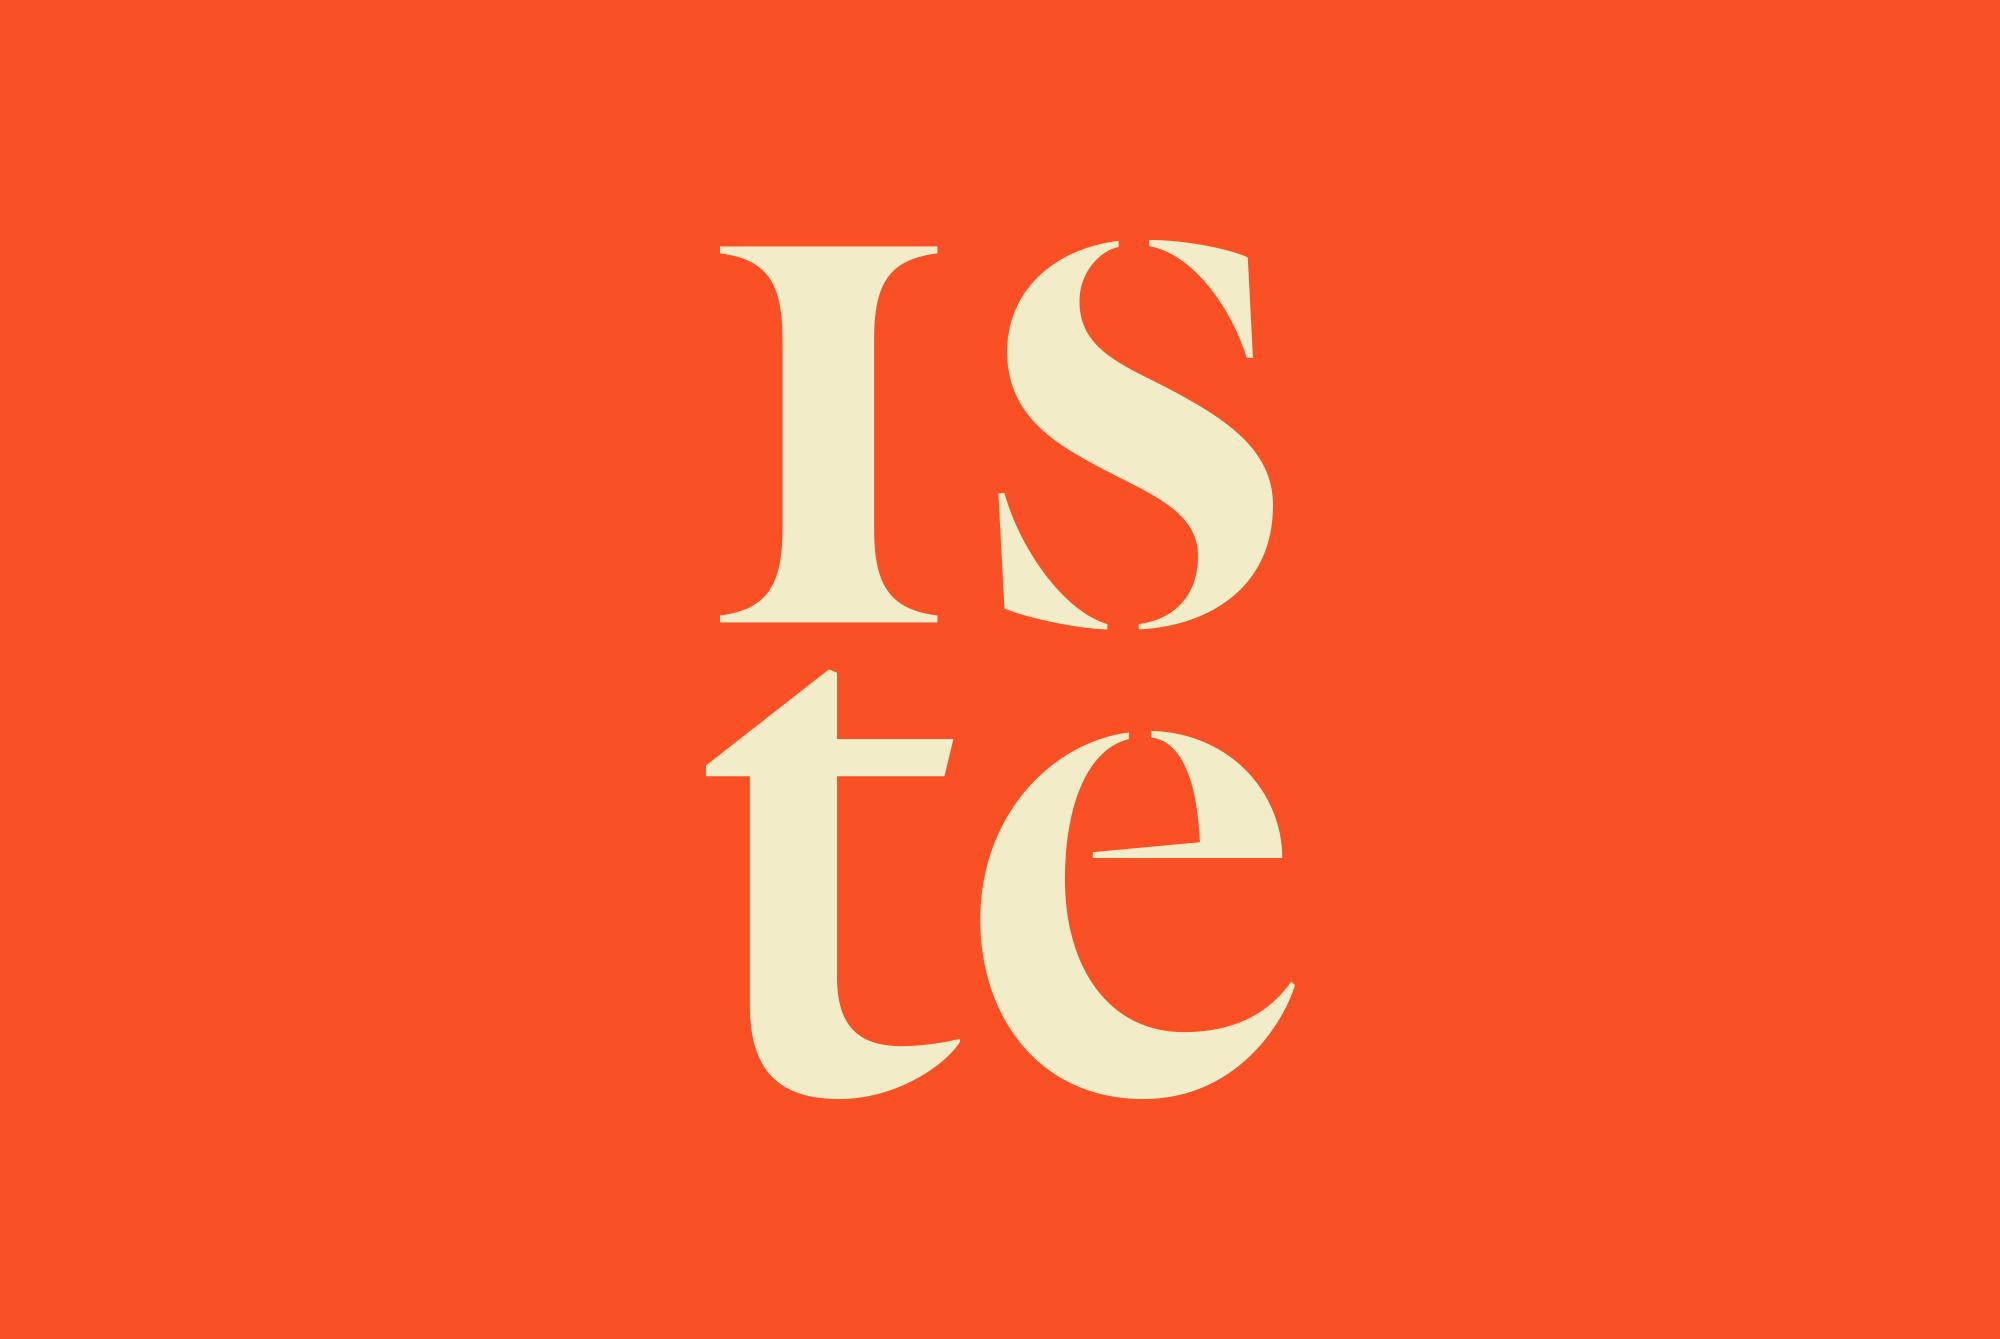 Imsdal Iste - logo